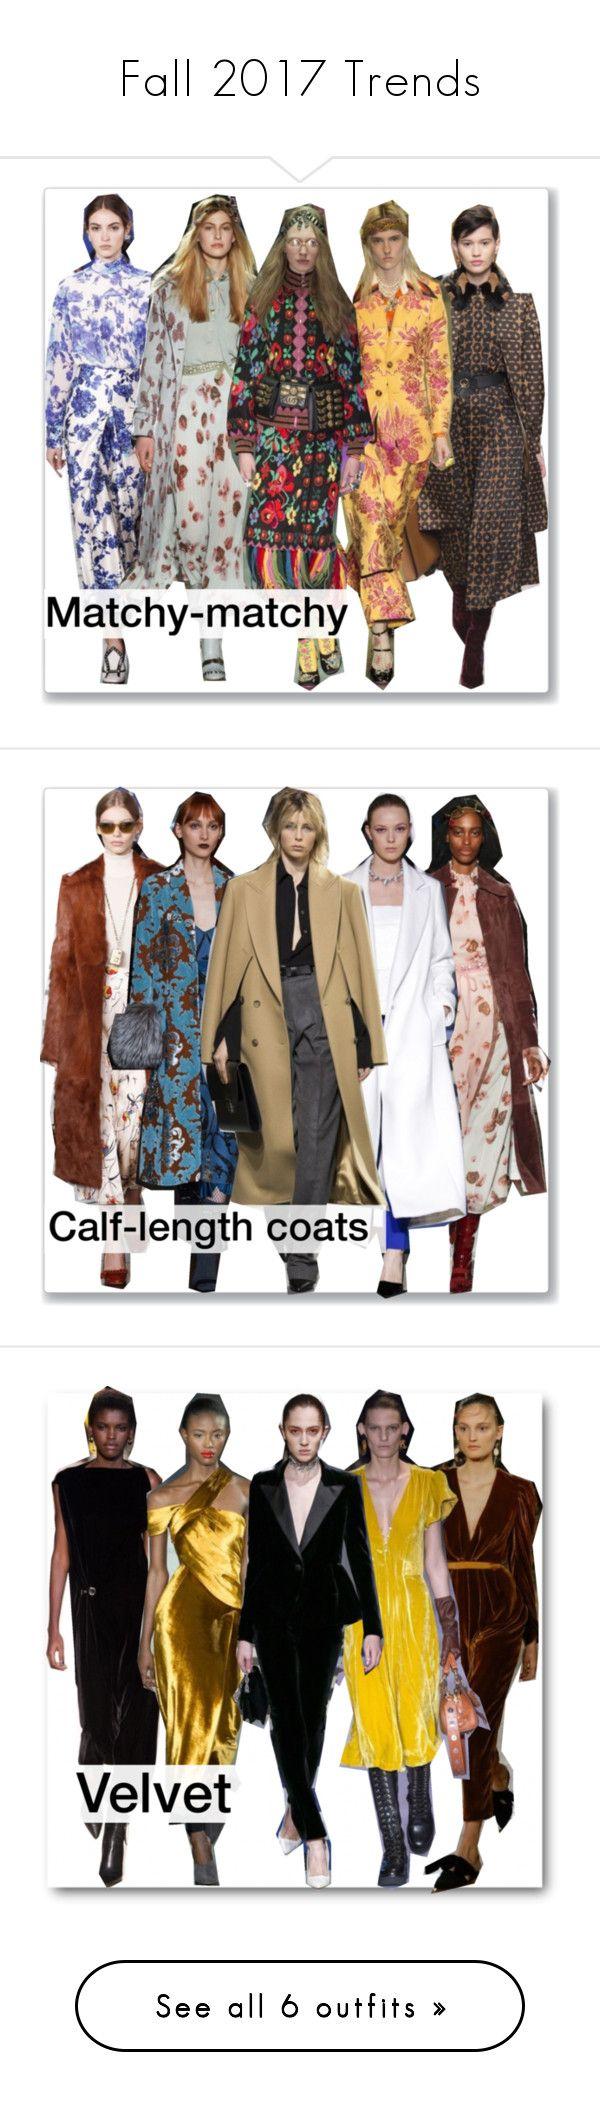 http://fashionistalooks.blogspot.gr/2017/08/fw-2017-18-trend-report-part-i.html#more